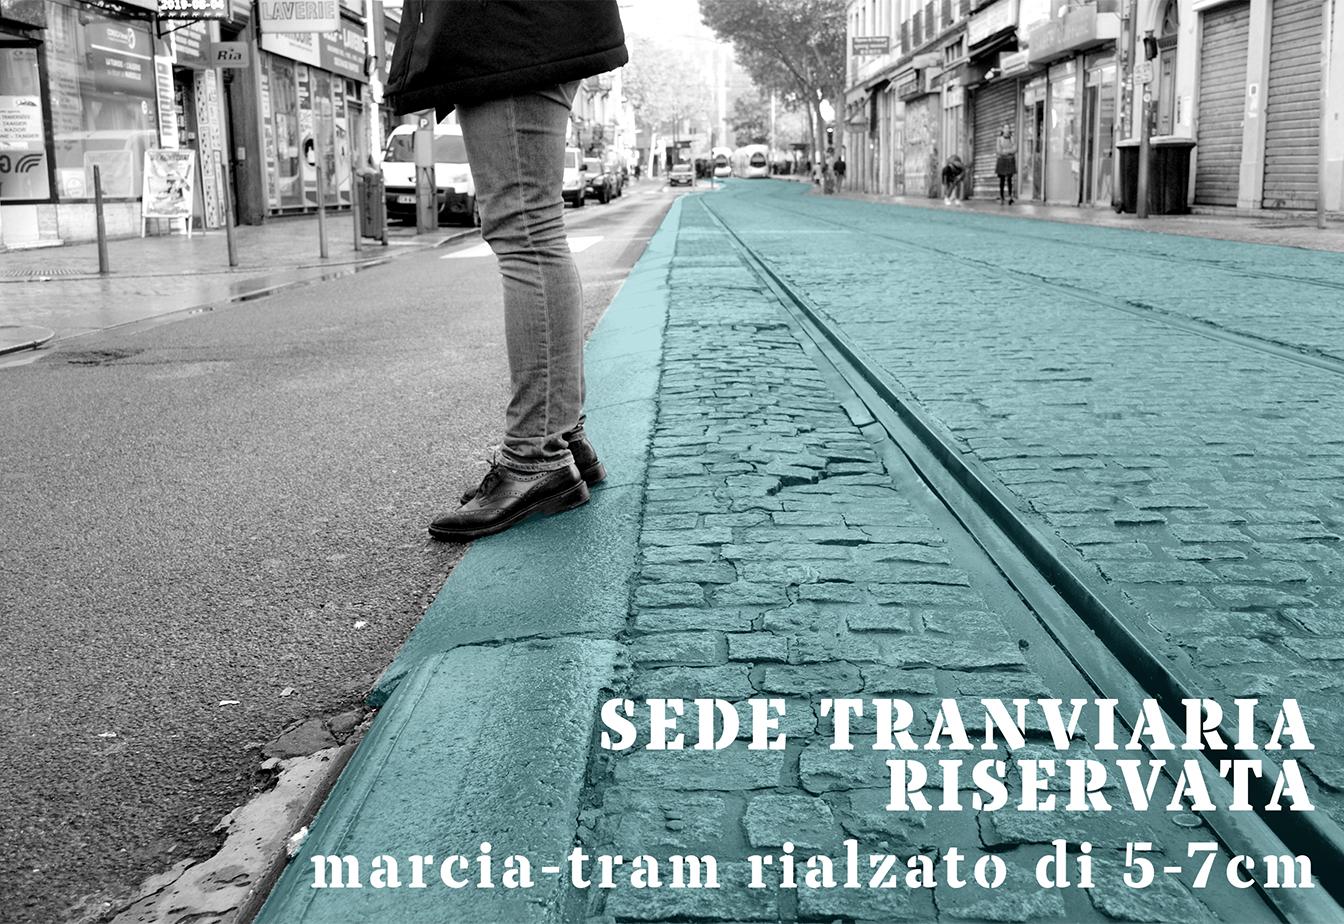 Sede tranviaria riservata - marcia-tram rialzato di 5-7 cm